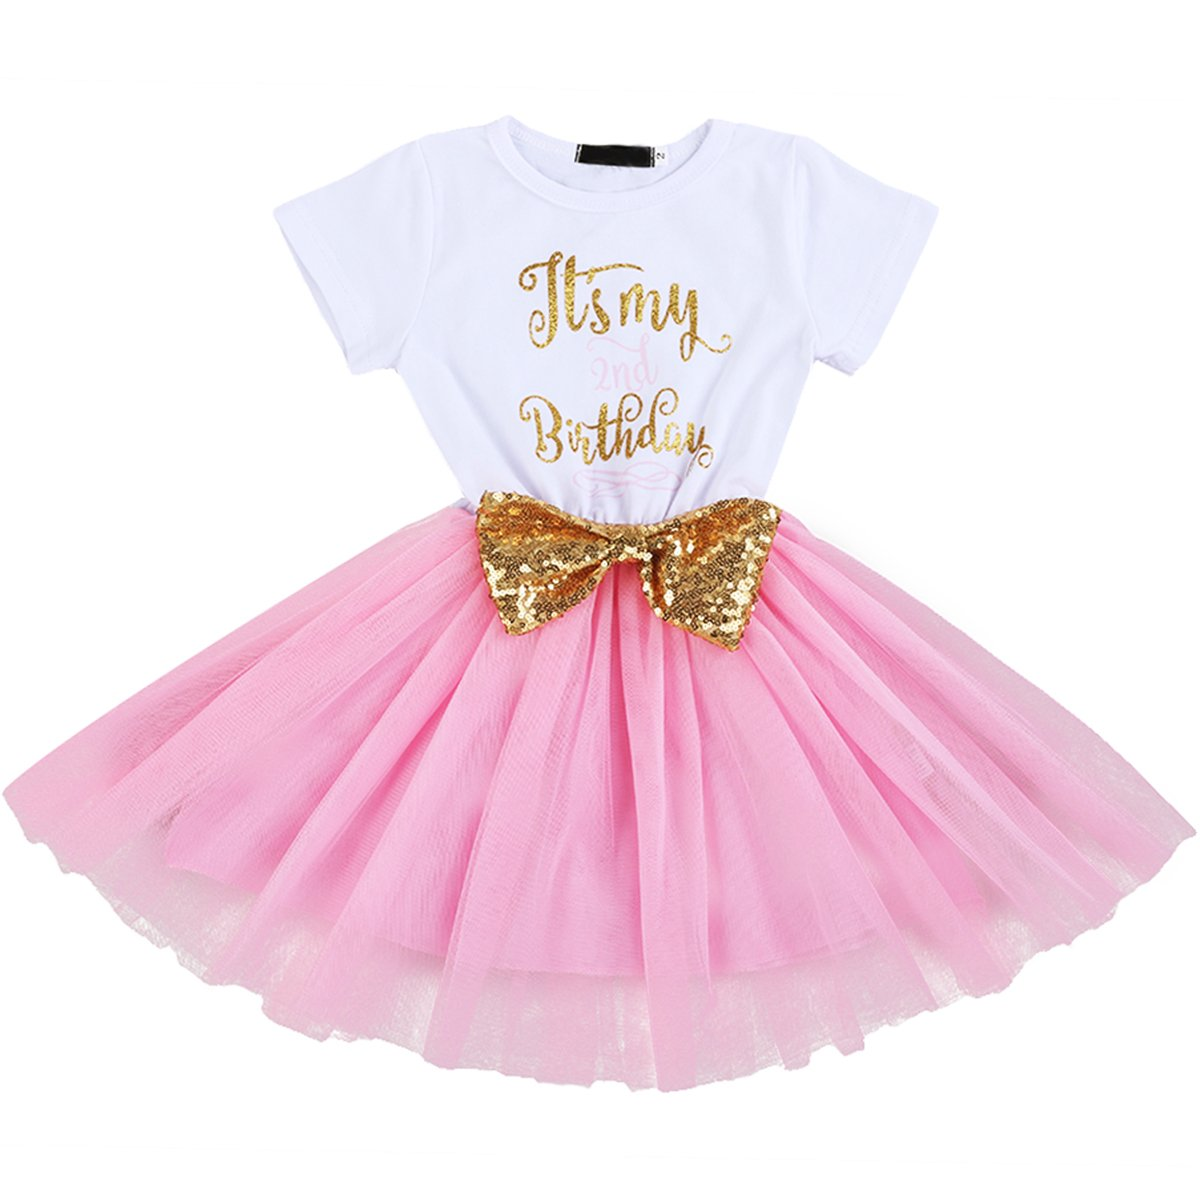 38402ee145 IBTOM CASTLE Baby Girls Newborn It's My 1st/2nd Birthday Cake Smash ...